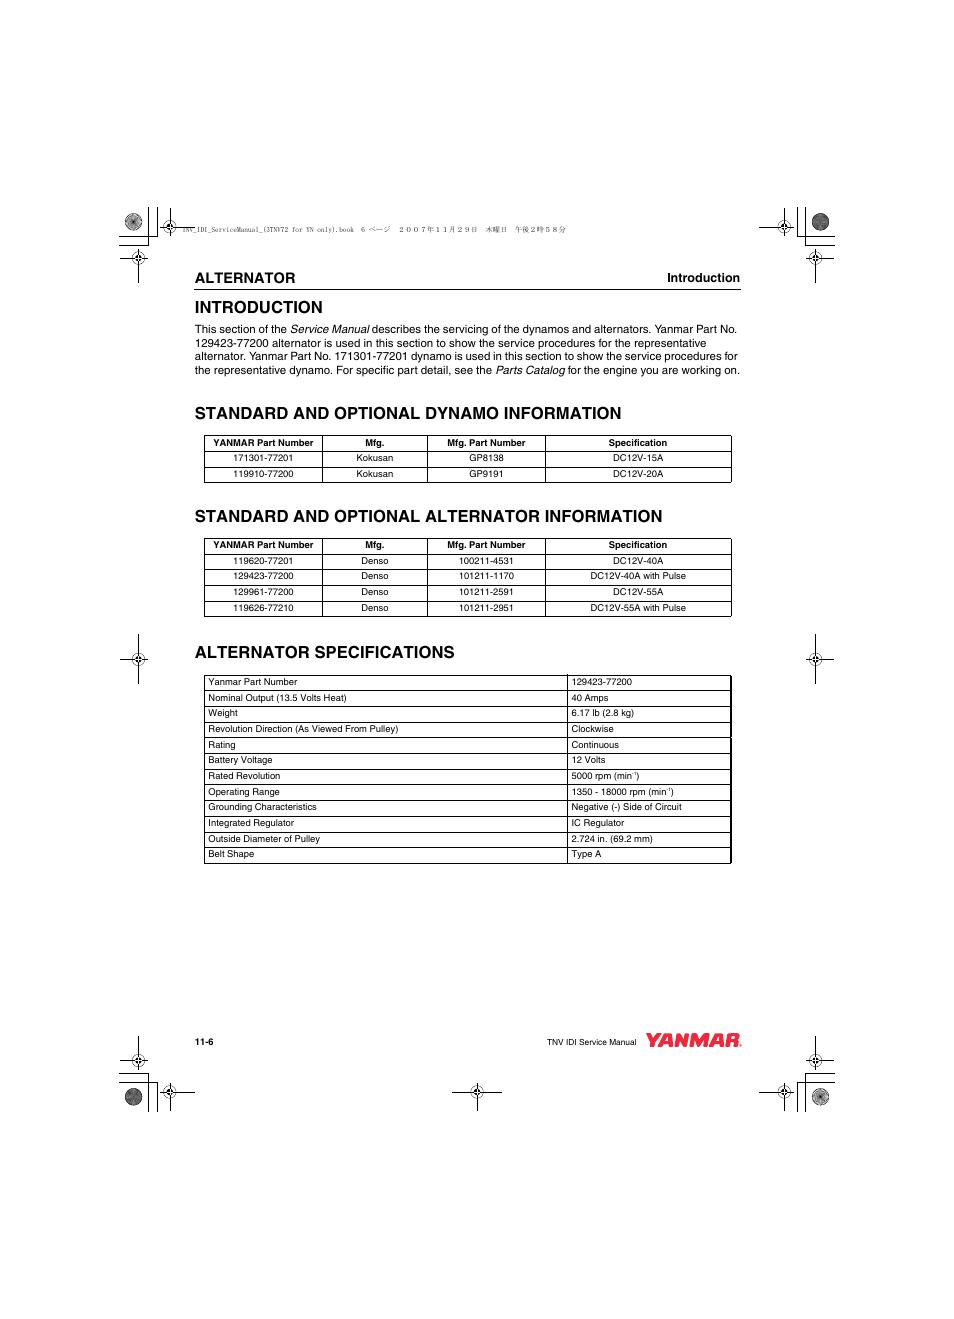 hight resolution of introduction alternator cub cadet yanmar 3tnv72 user manual page 239 283